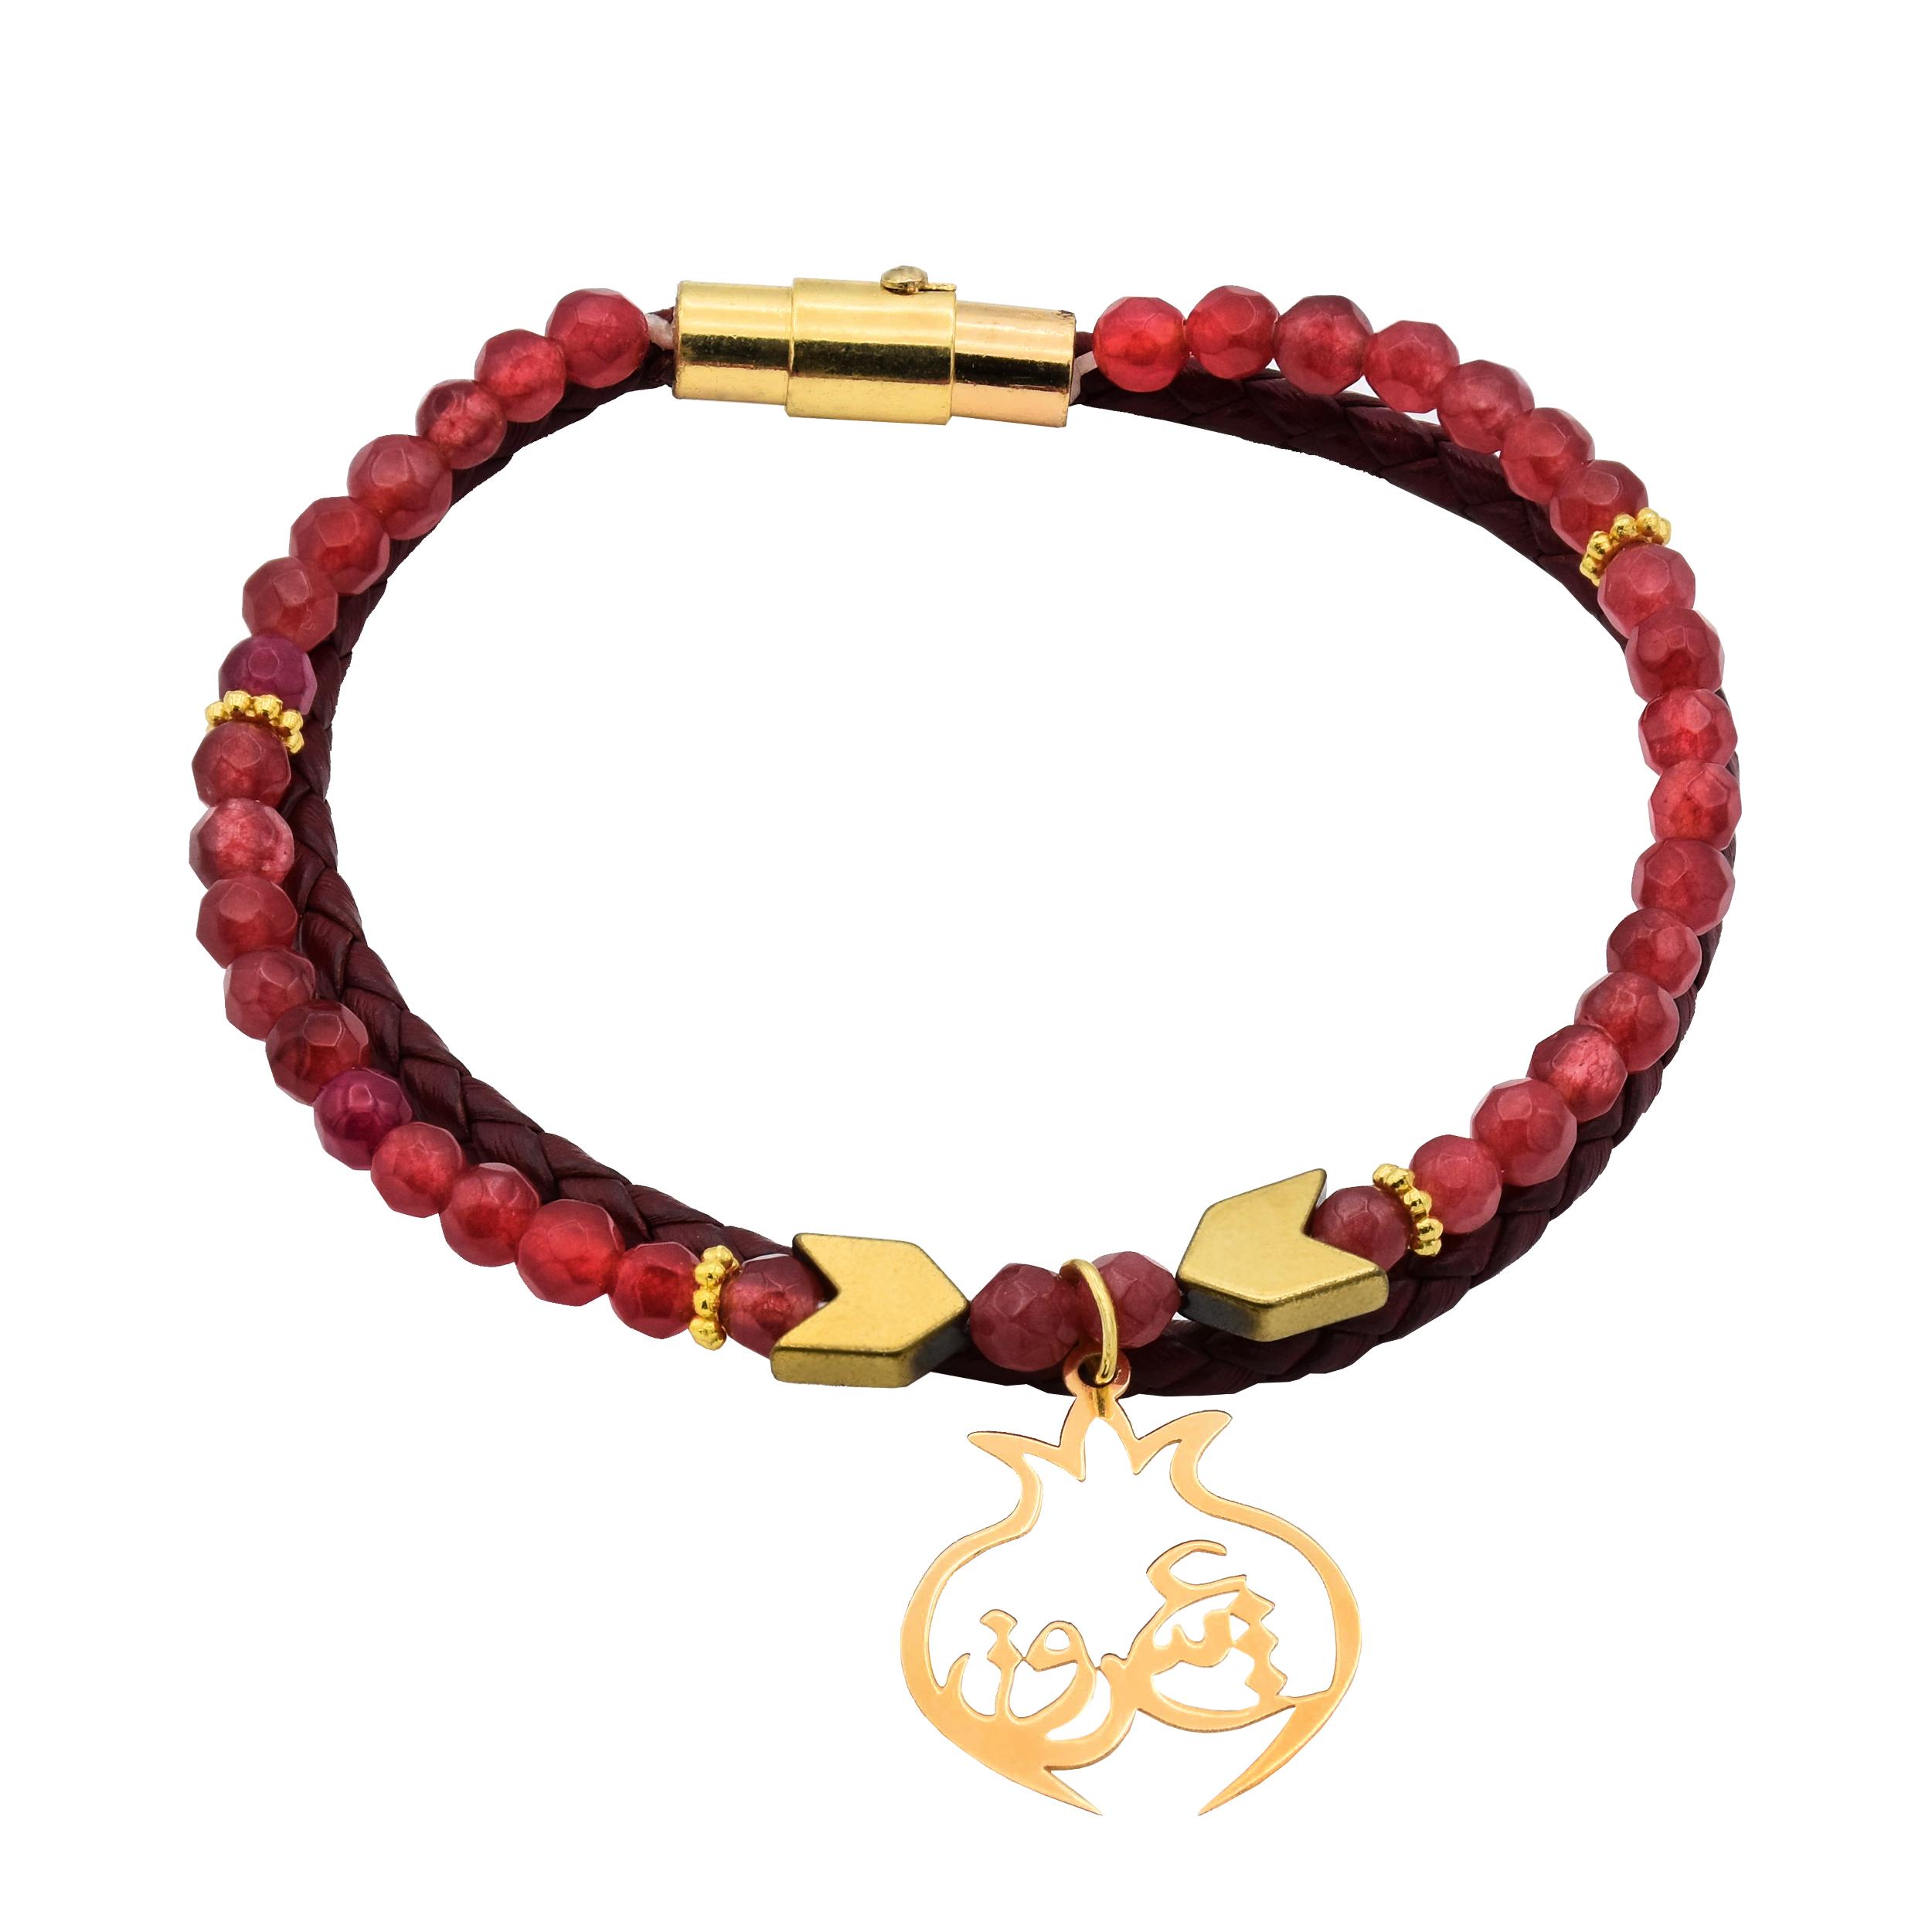 دستبند طلا 18 عیار زنانه آمانژ طرح عشق کد 714D3123